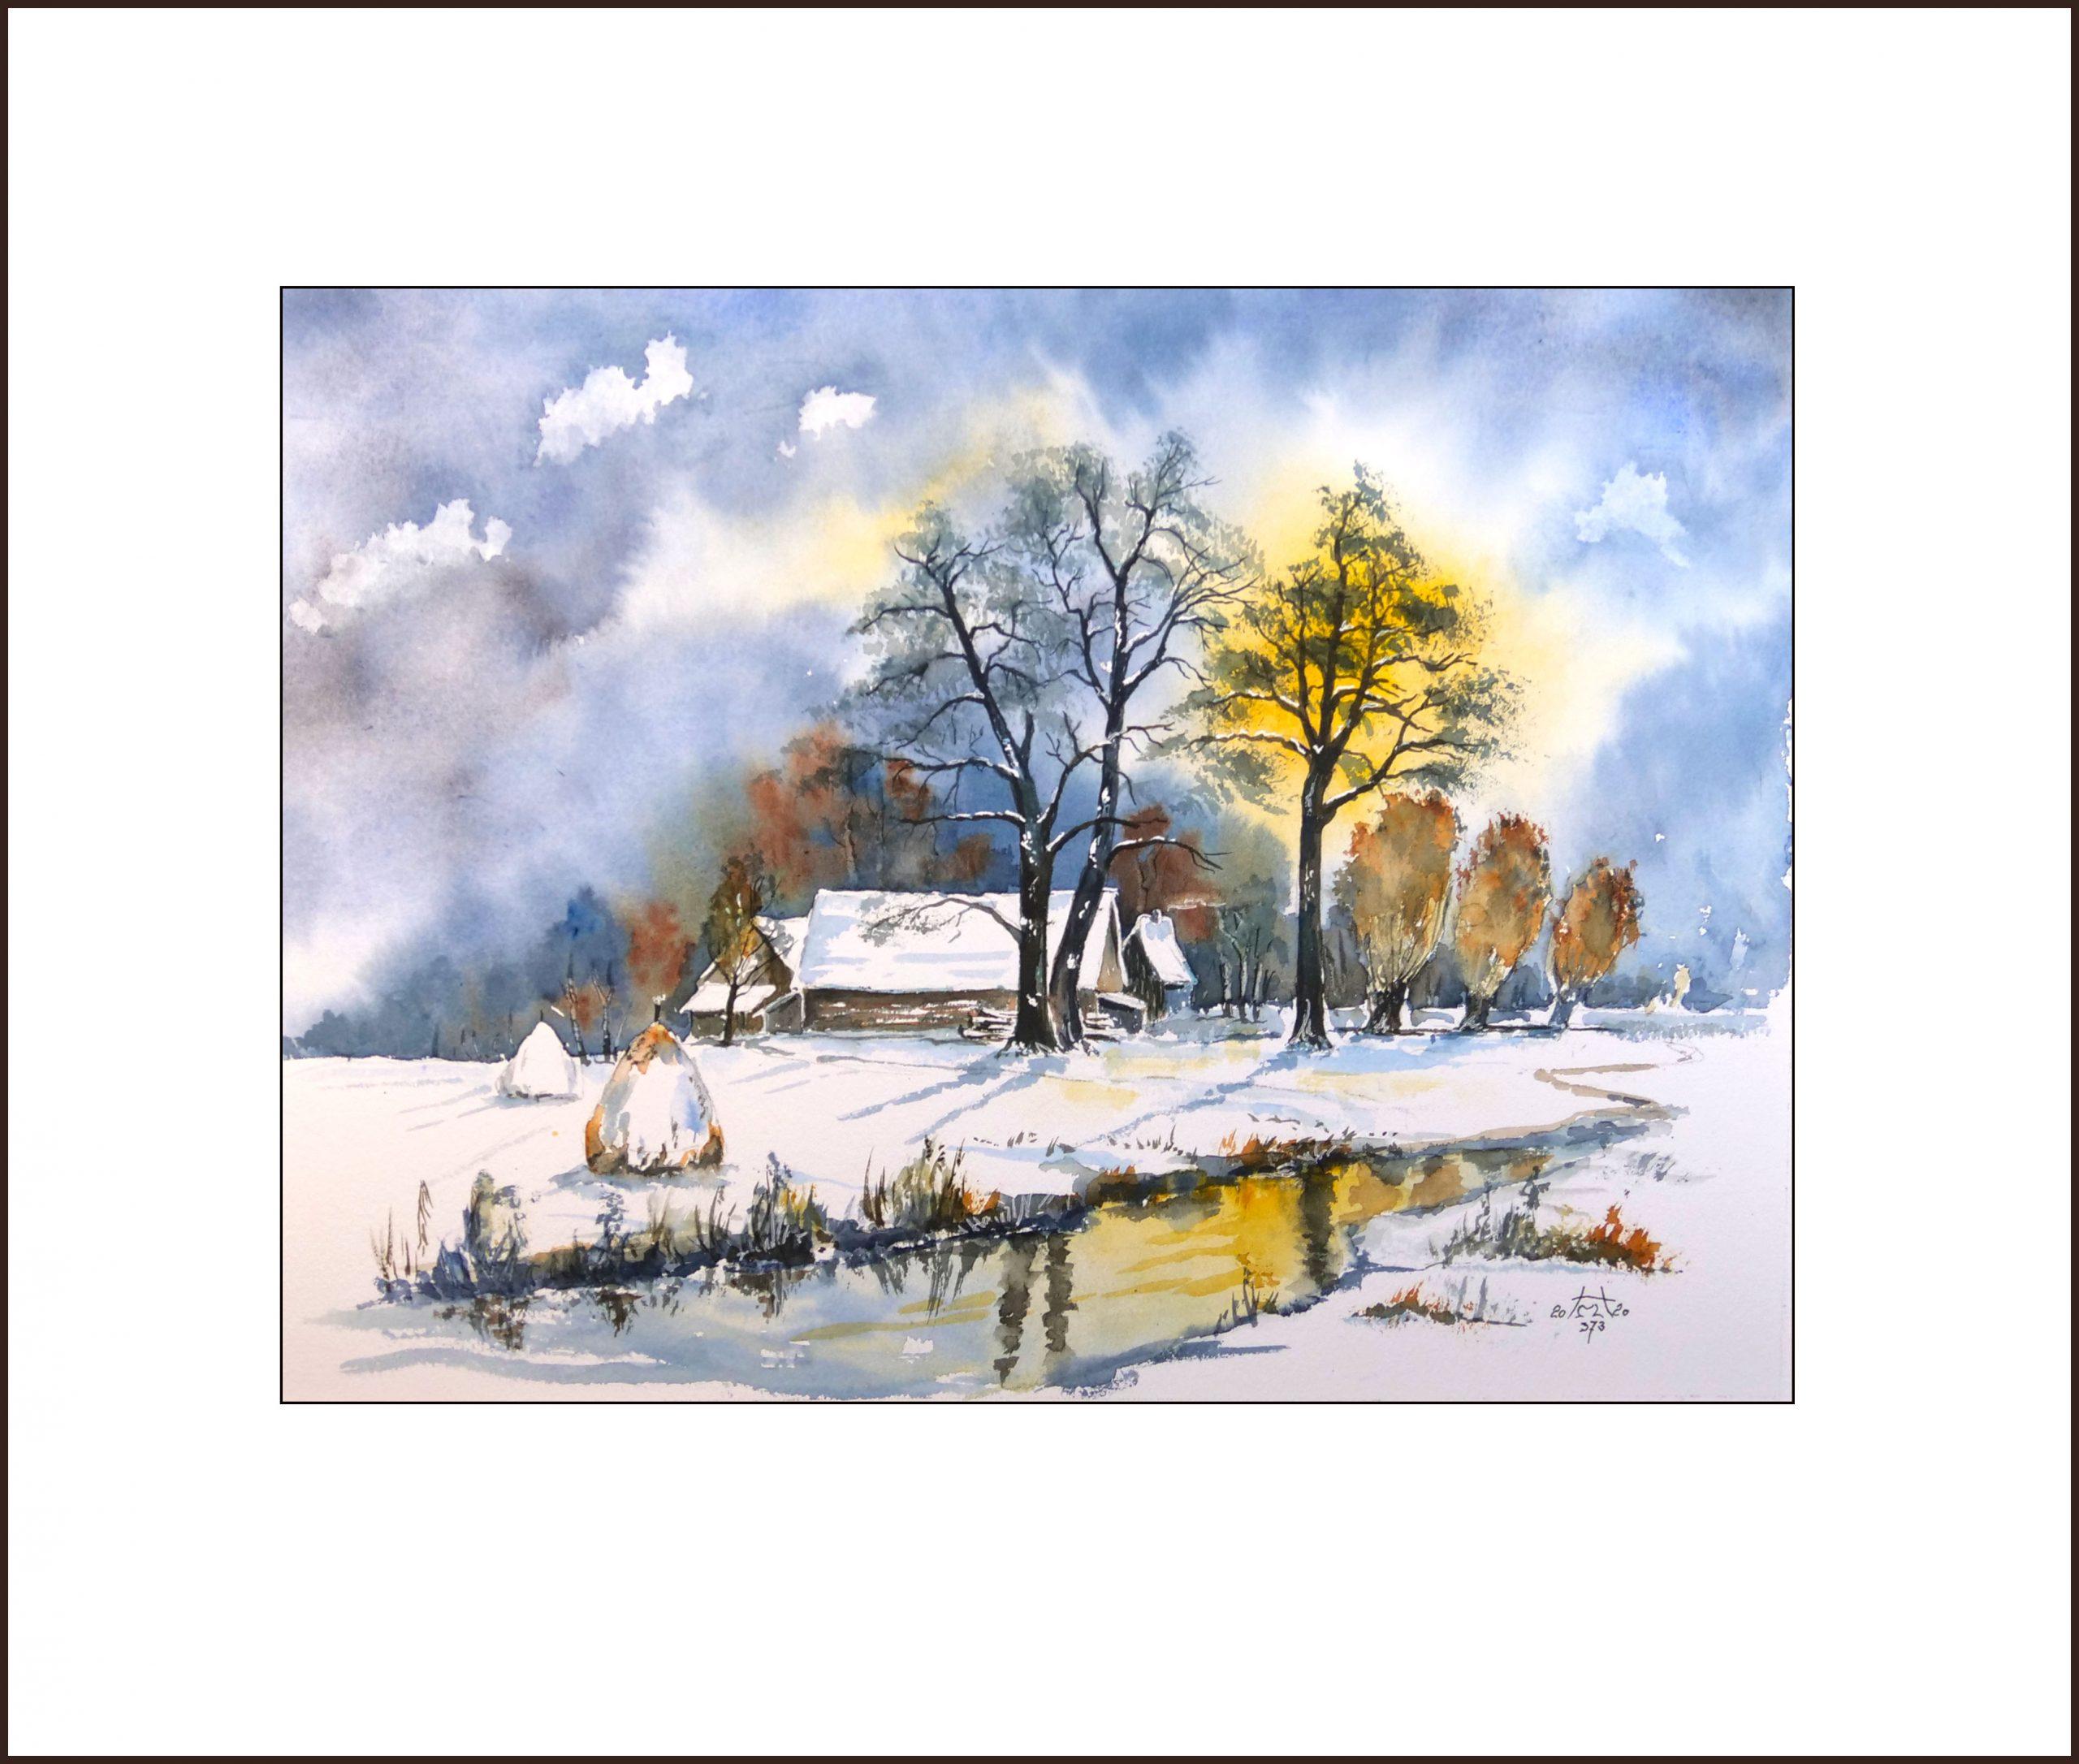 Wintertag im Spreewald, Aquarell, 40×50 cm, Nr. 373